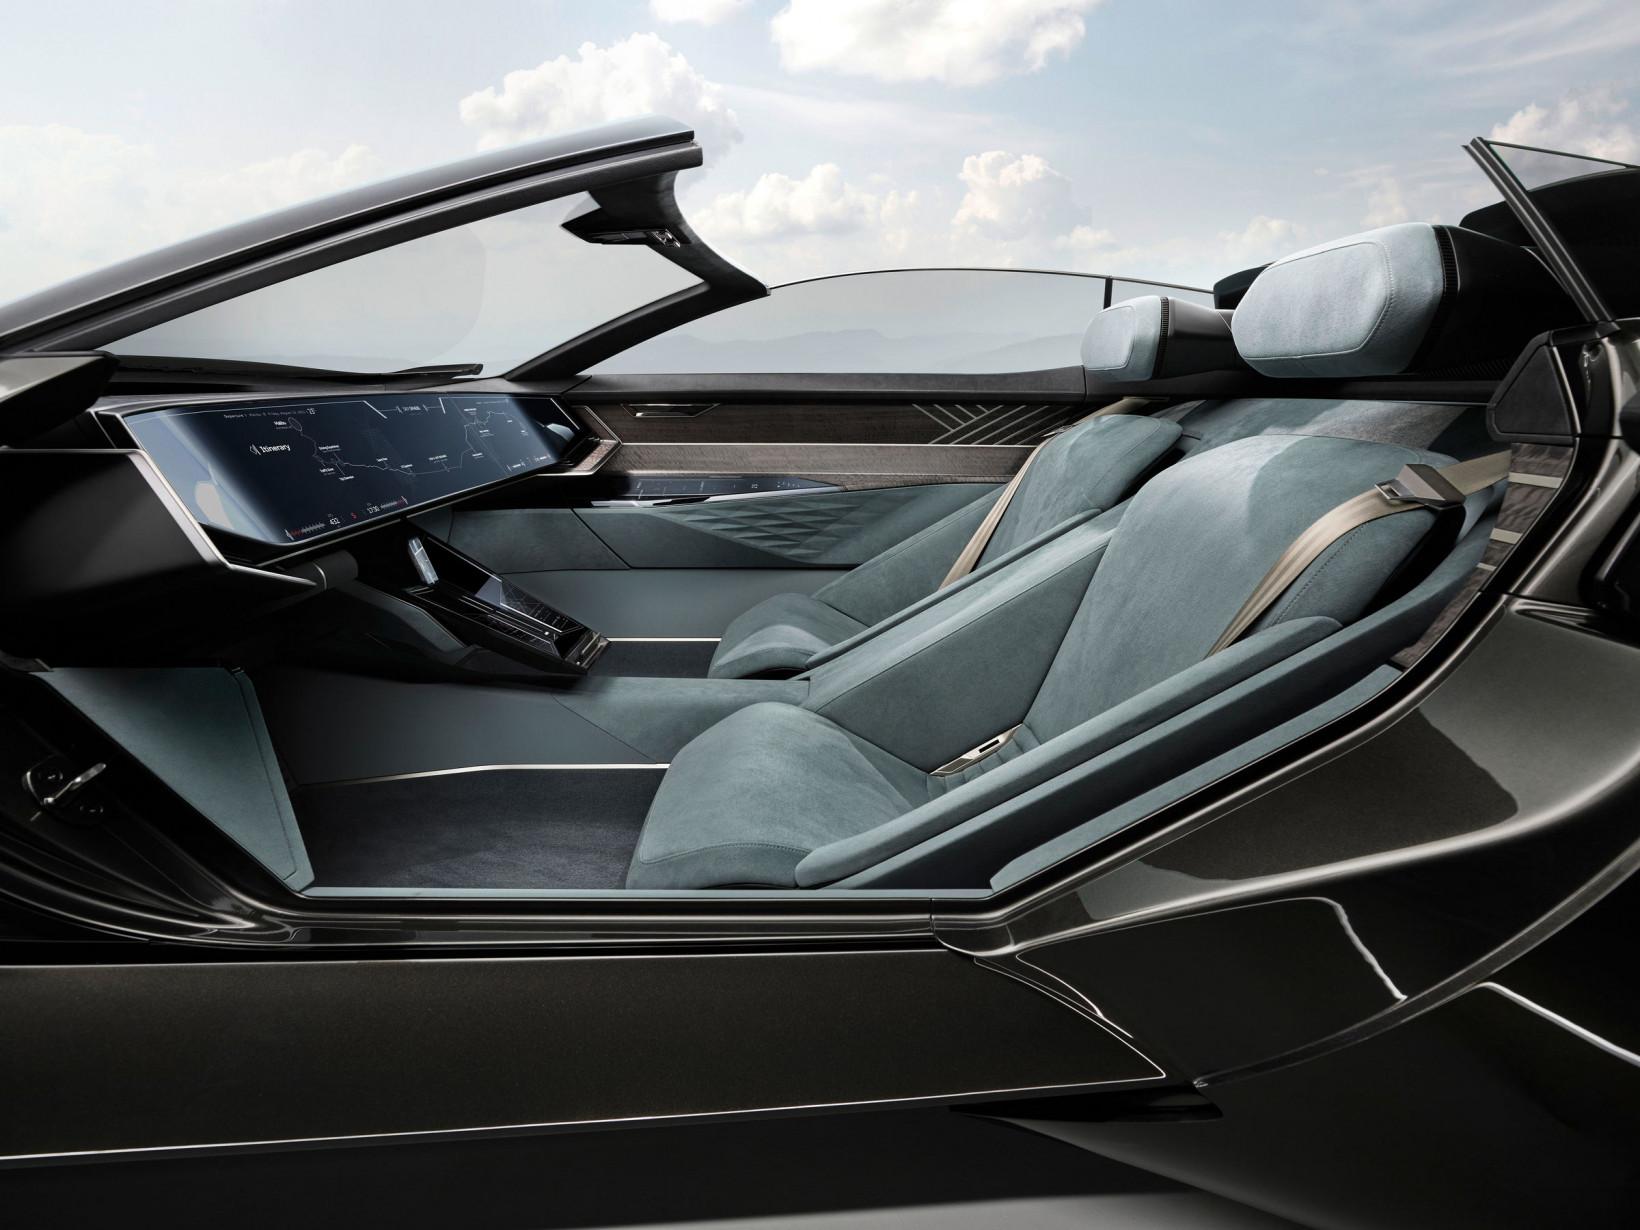 The Audi Skysphere concept car